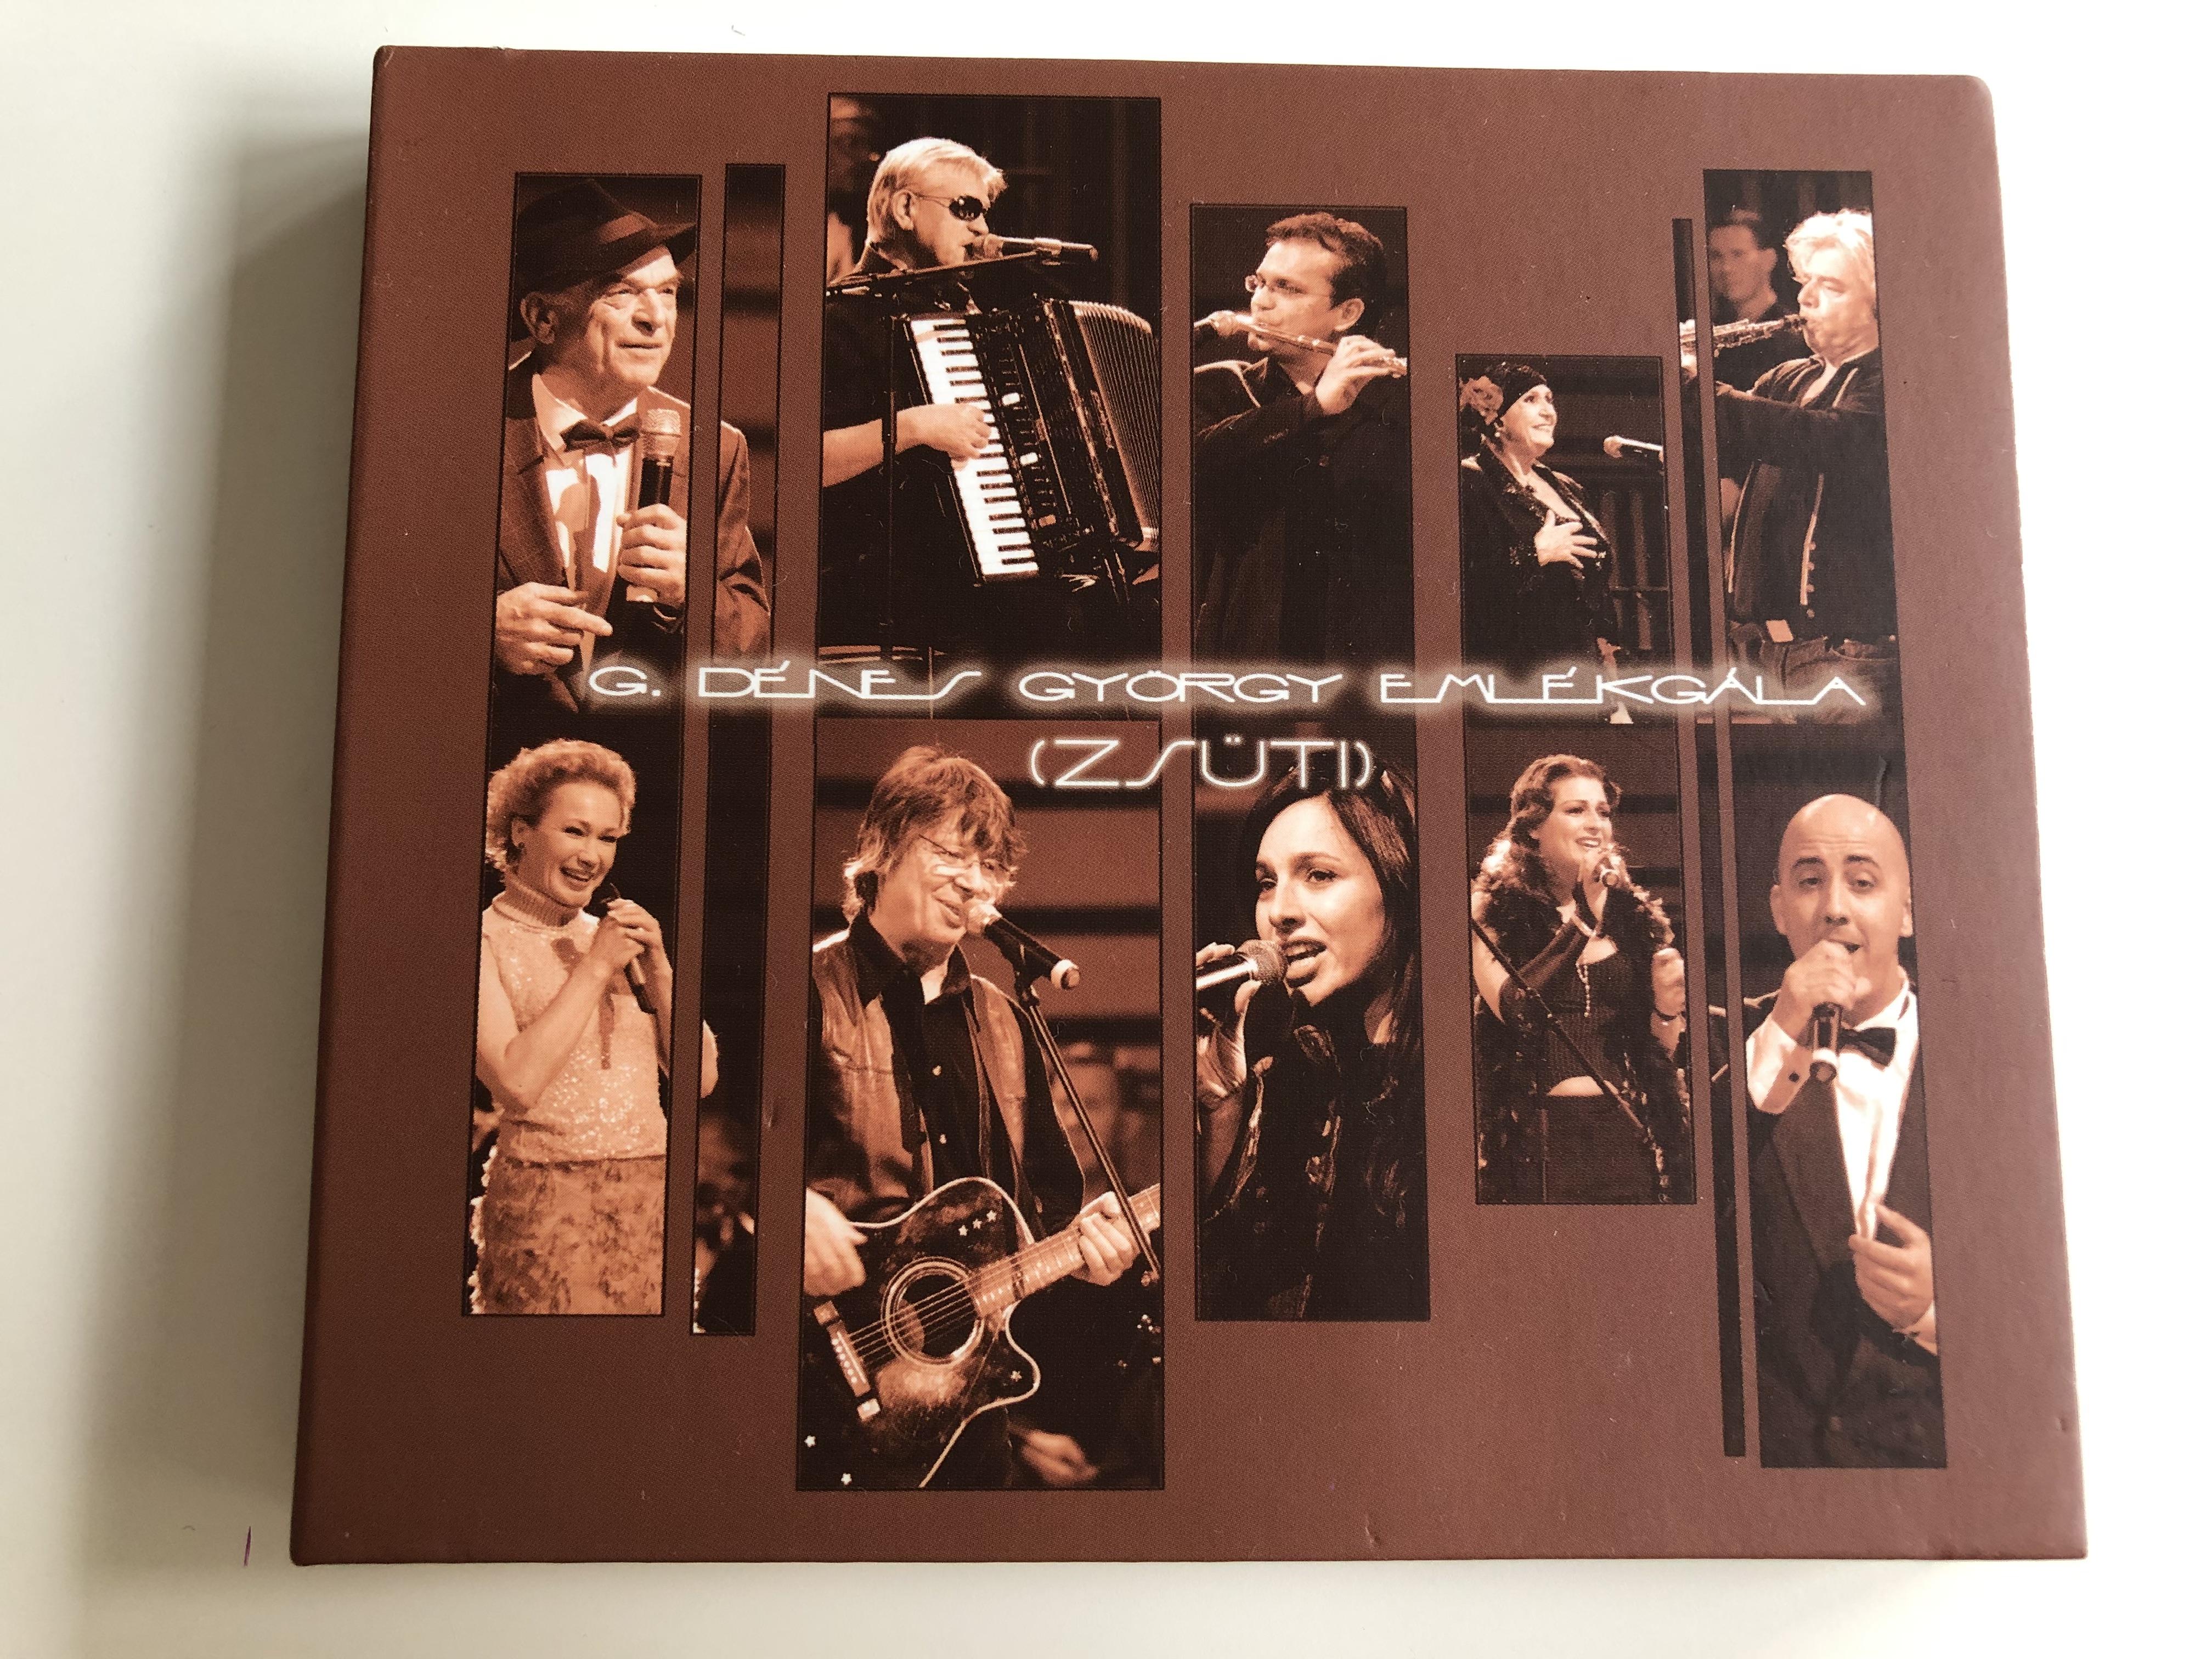 g.-d-nes-gy-rgy-eml-kg-la-zs-ti-danubia-symphony-orchestra-r-tonyi-r-bert-concert-master-bujtor-bal-zs-magneoton-audio-cd-2006-1-.jpg